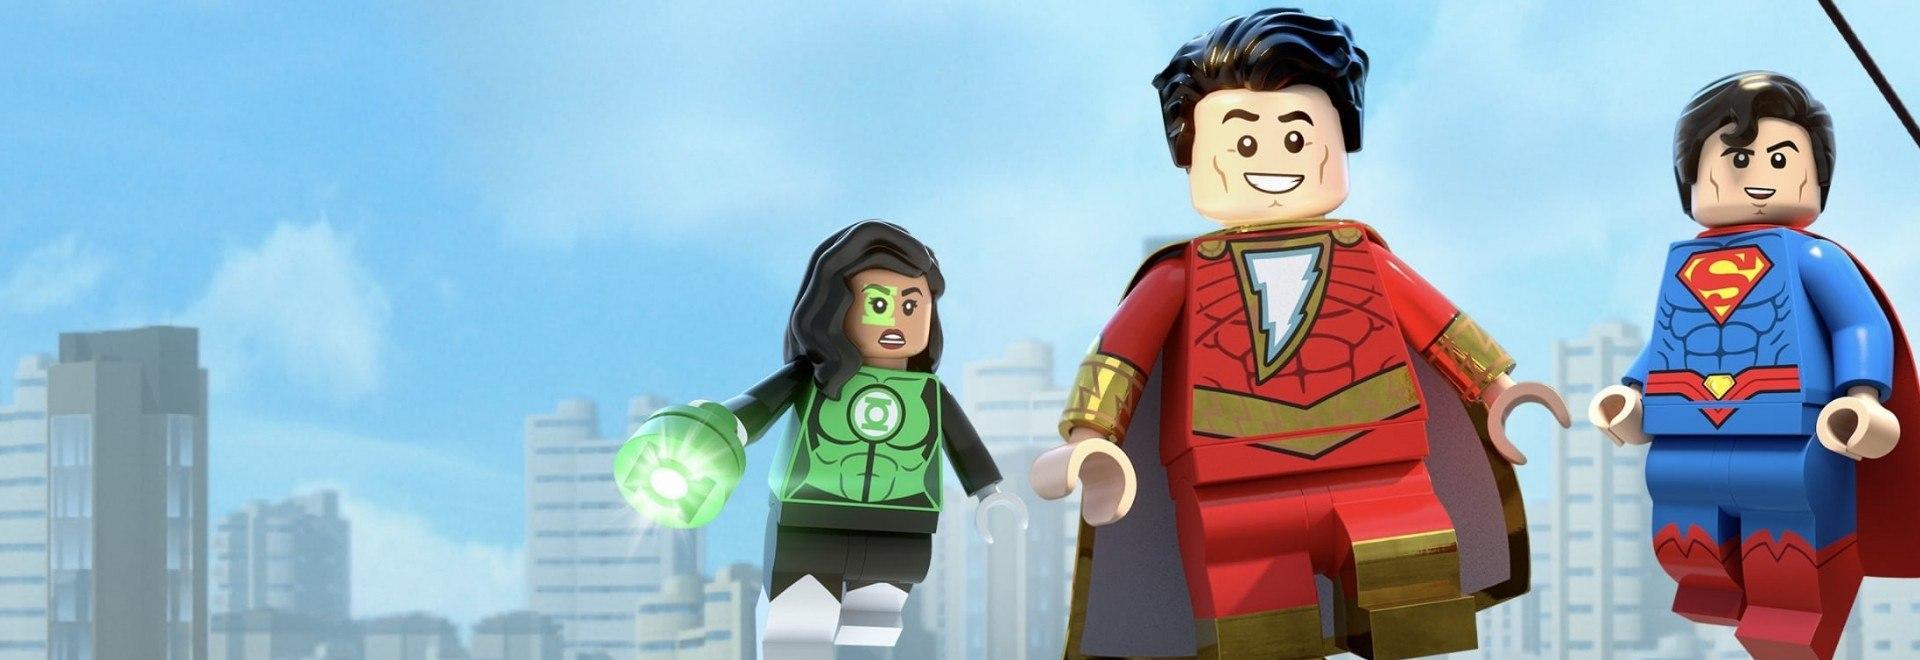 Lego DC Shazam: Shazam contro Black Adam